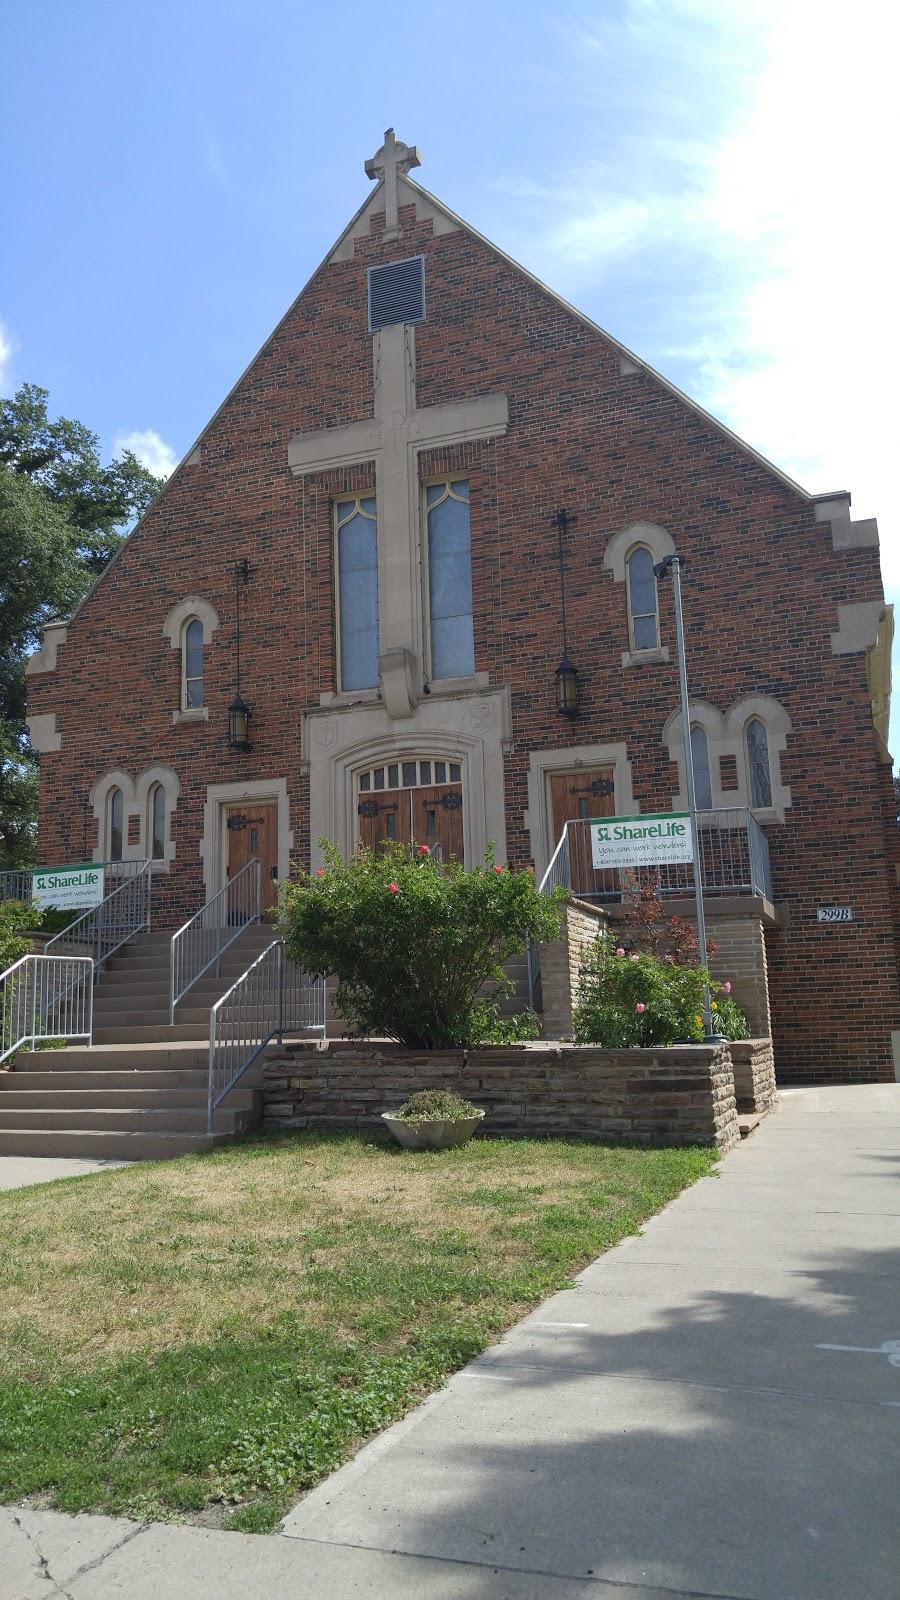 Holy Cross Church   church   291 Cosburn Ave, East York, ON M4J 2M4, Canada   4164215225 OR +1 416-421-5225